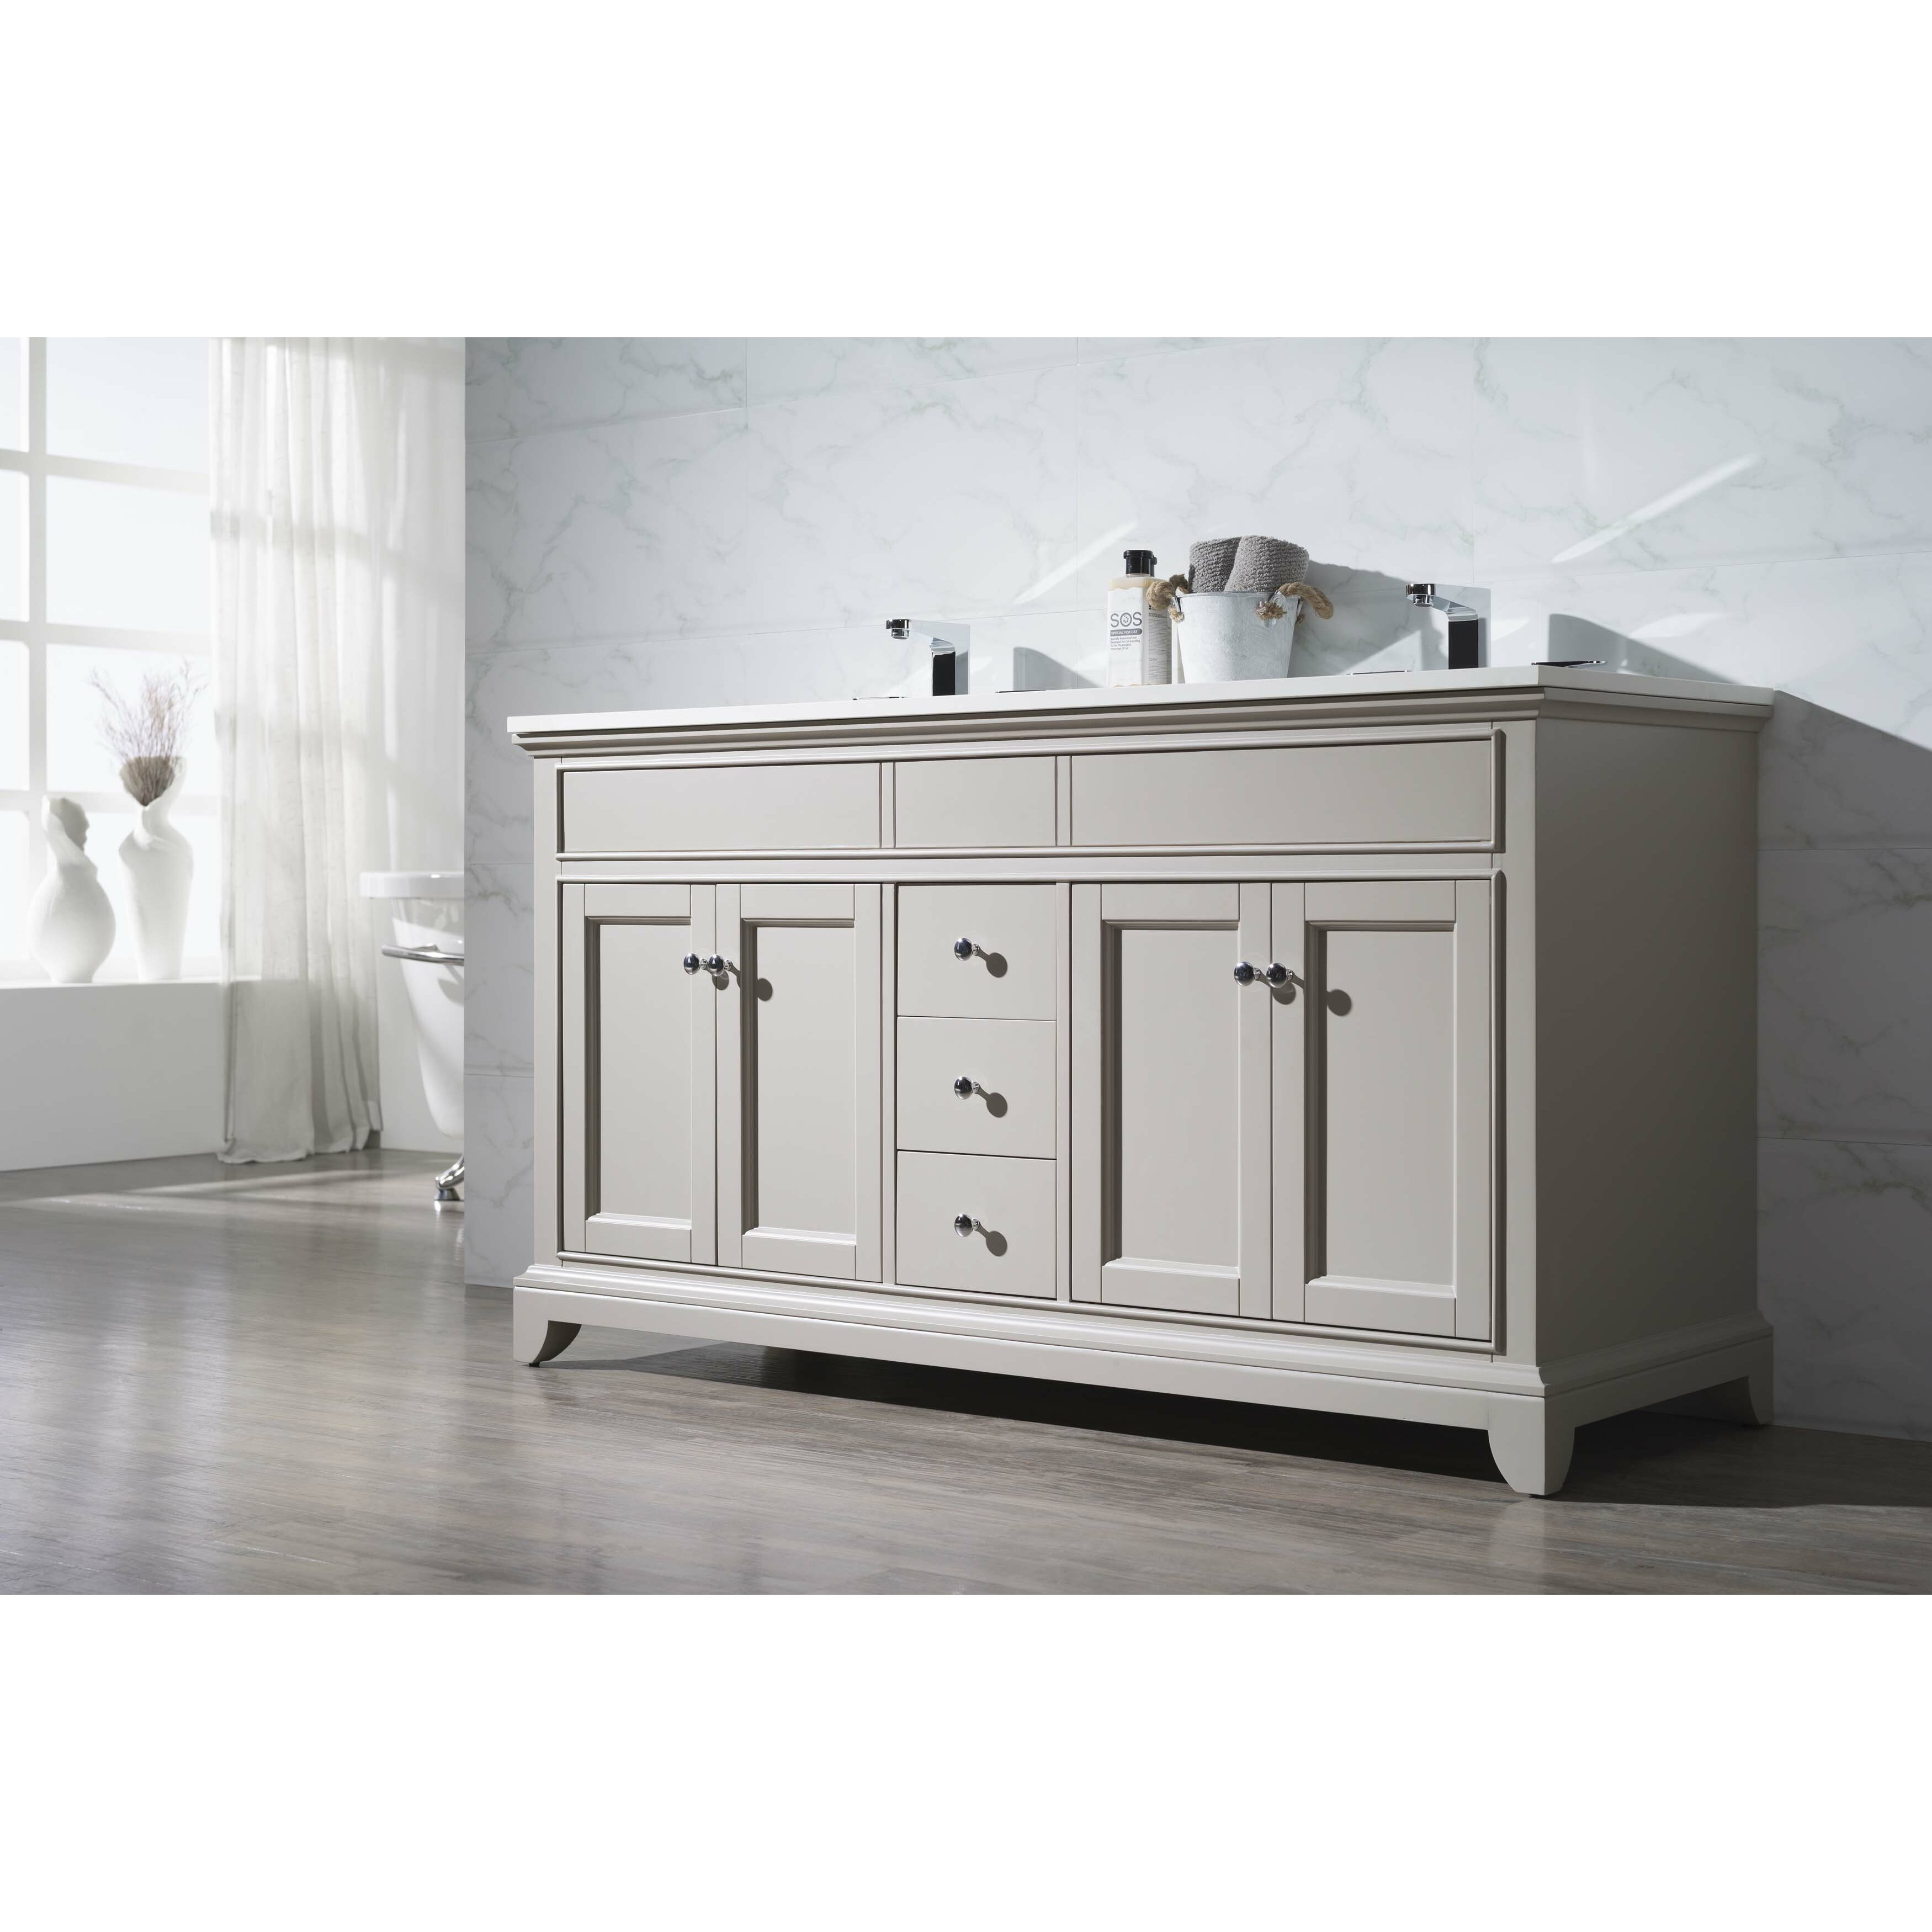 Home Loft Concepts 59 Double Sink Bathroom Vanity Set